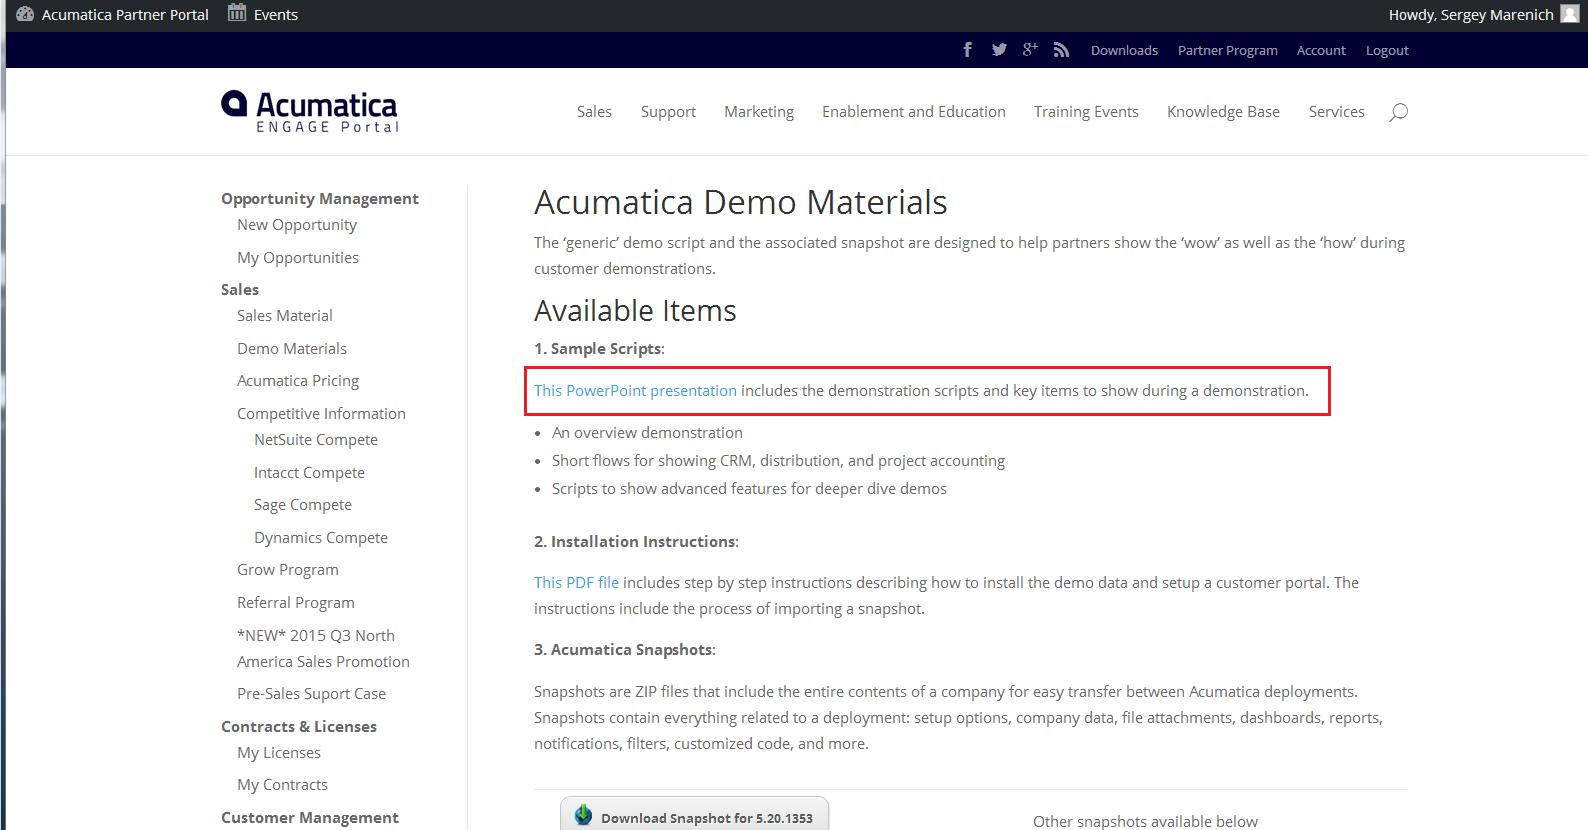 Acumatica Partner Portal - Demonstration Scripts